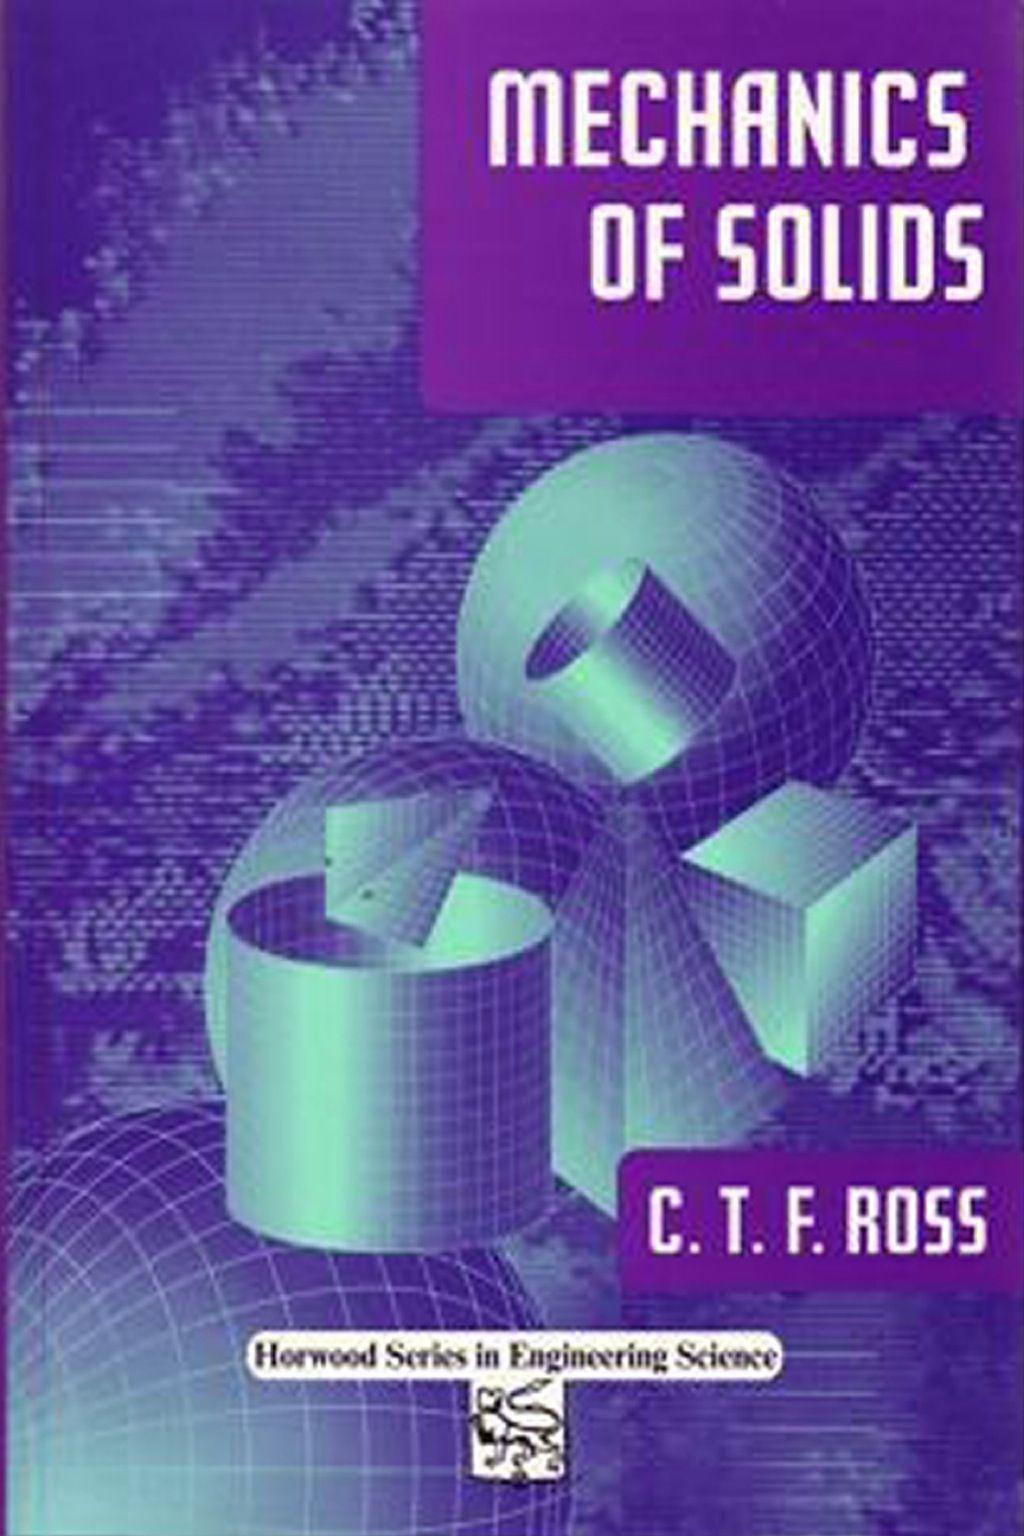 Mechanics Of Solids Ebook Repair Manuals Pdf Mechanical Design